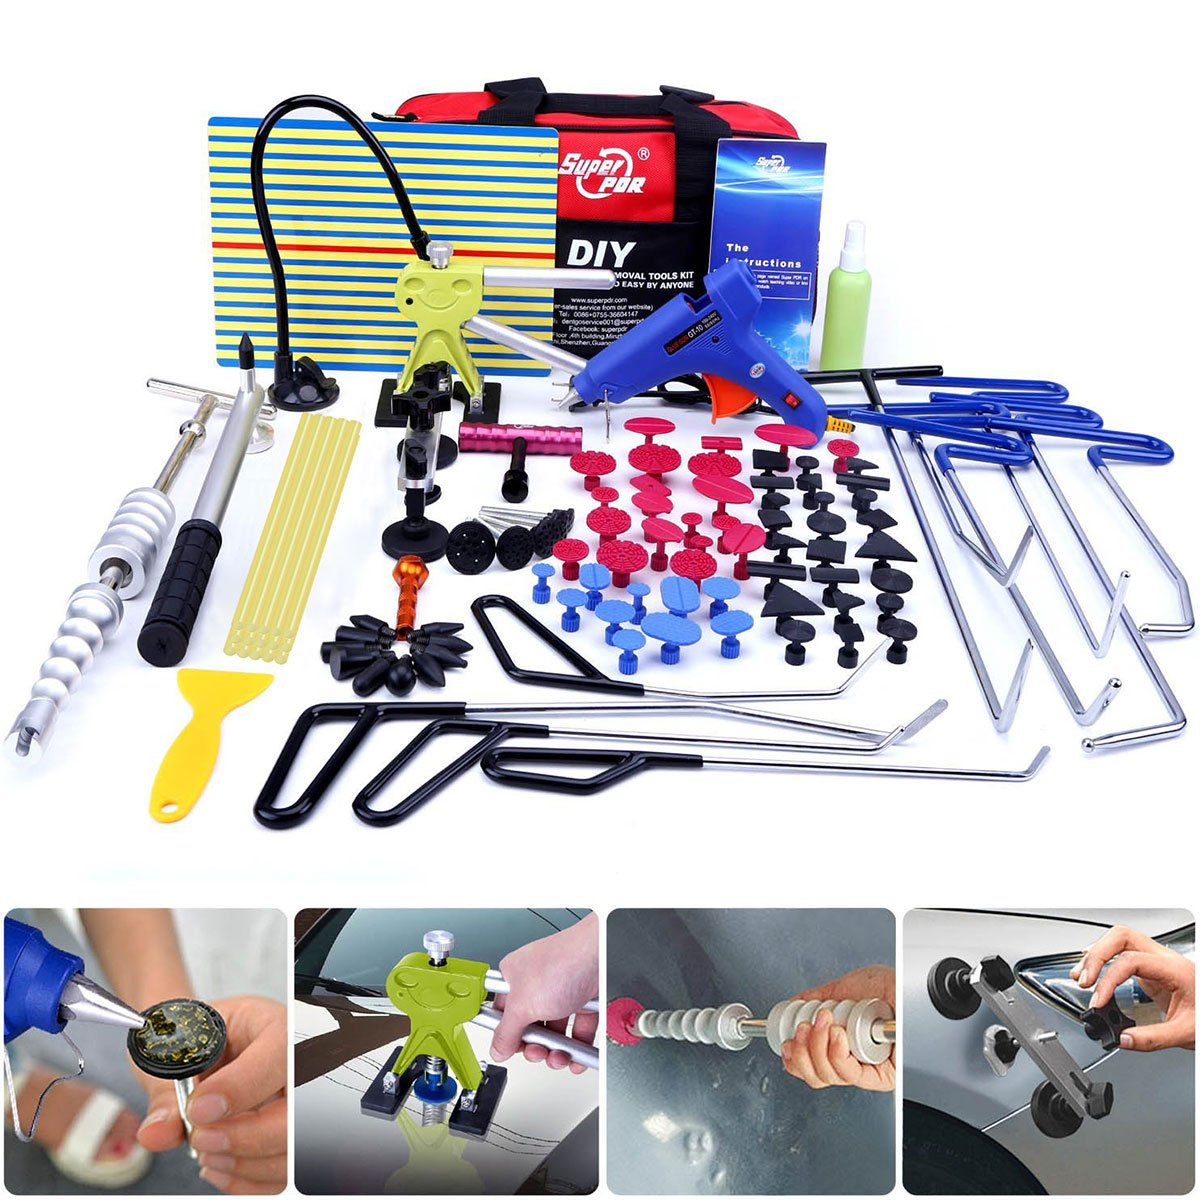 Super PDR 91Pcs PDR Rod Tools Kit Professional Hail Damage Door Ding Repair Kit Car Auto Body Paintless Dent Repair Removal Tool Set PDR Dent Puller kit Slide Hammer Push Rods